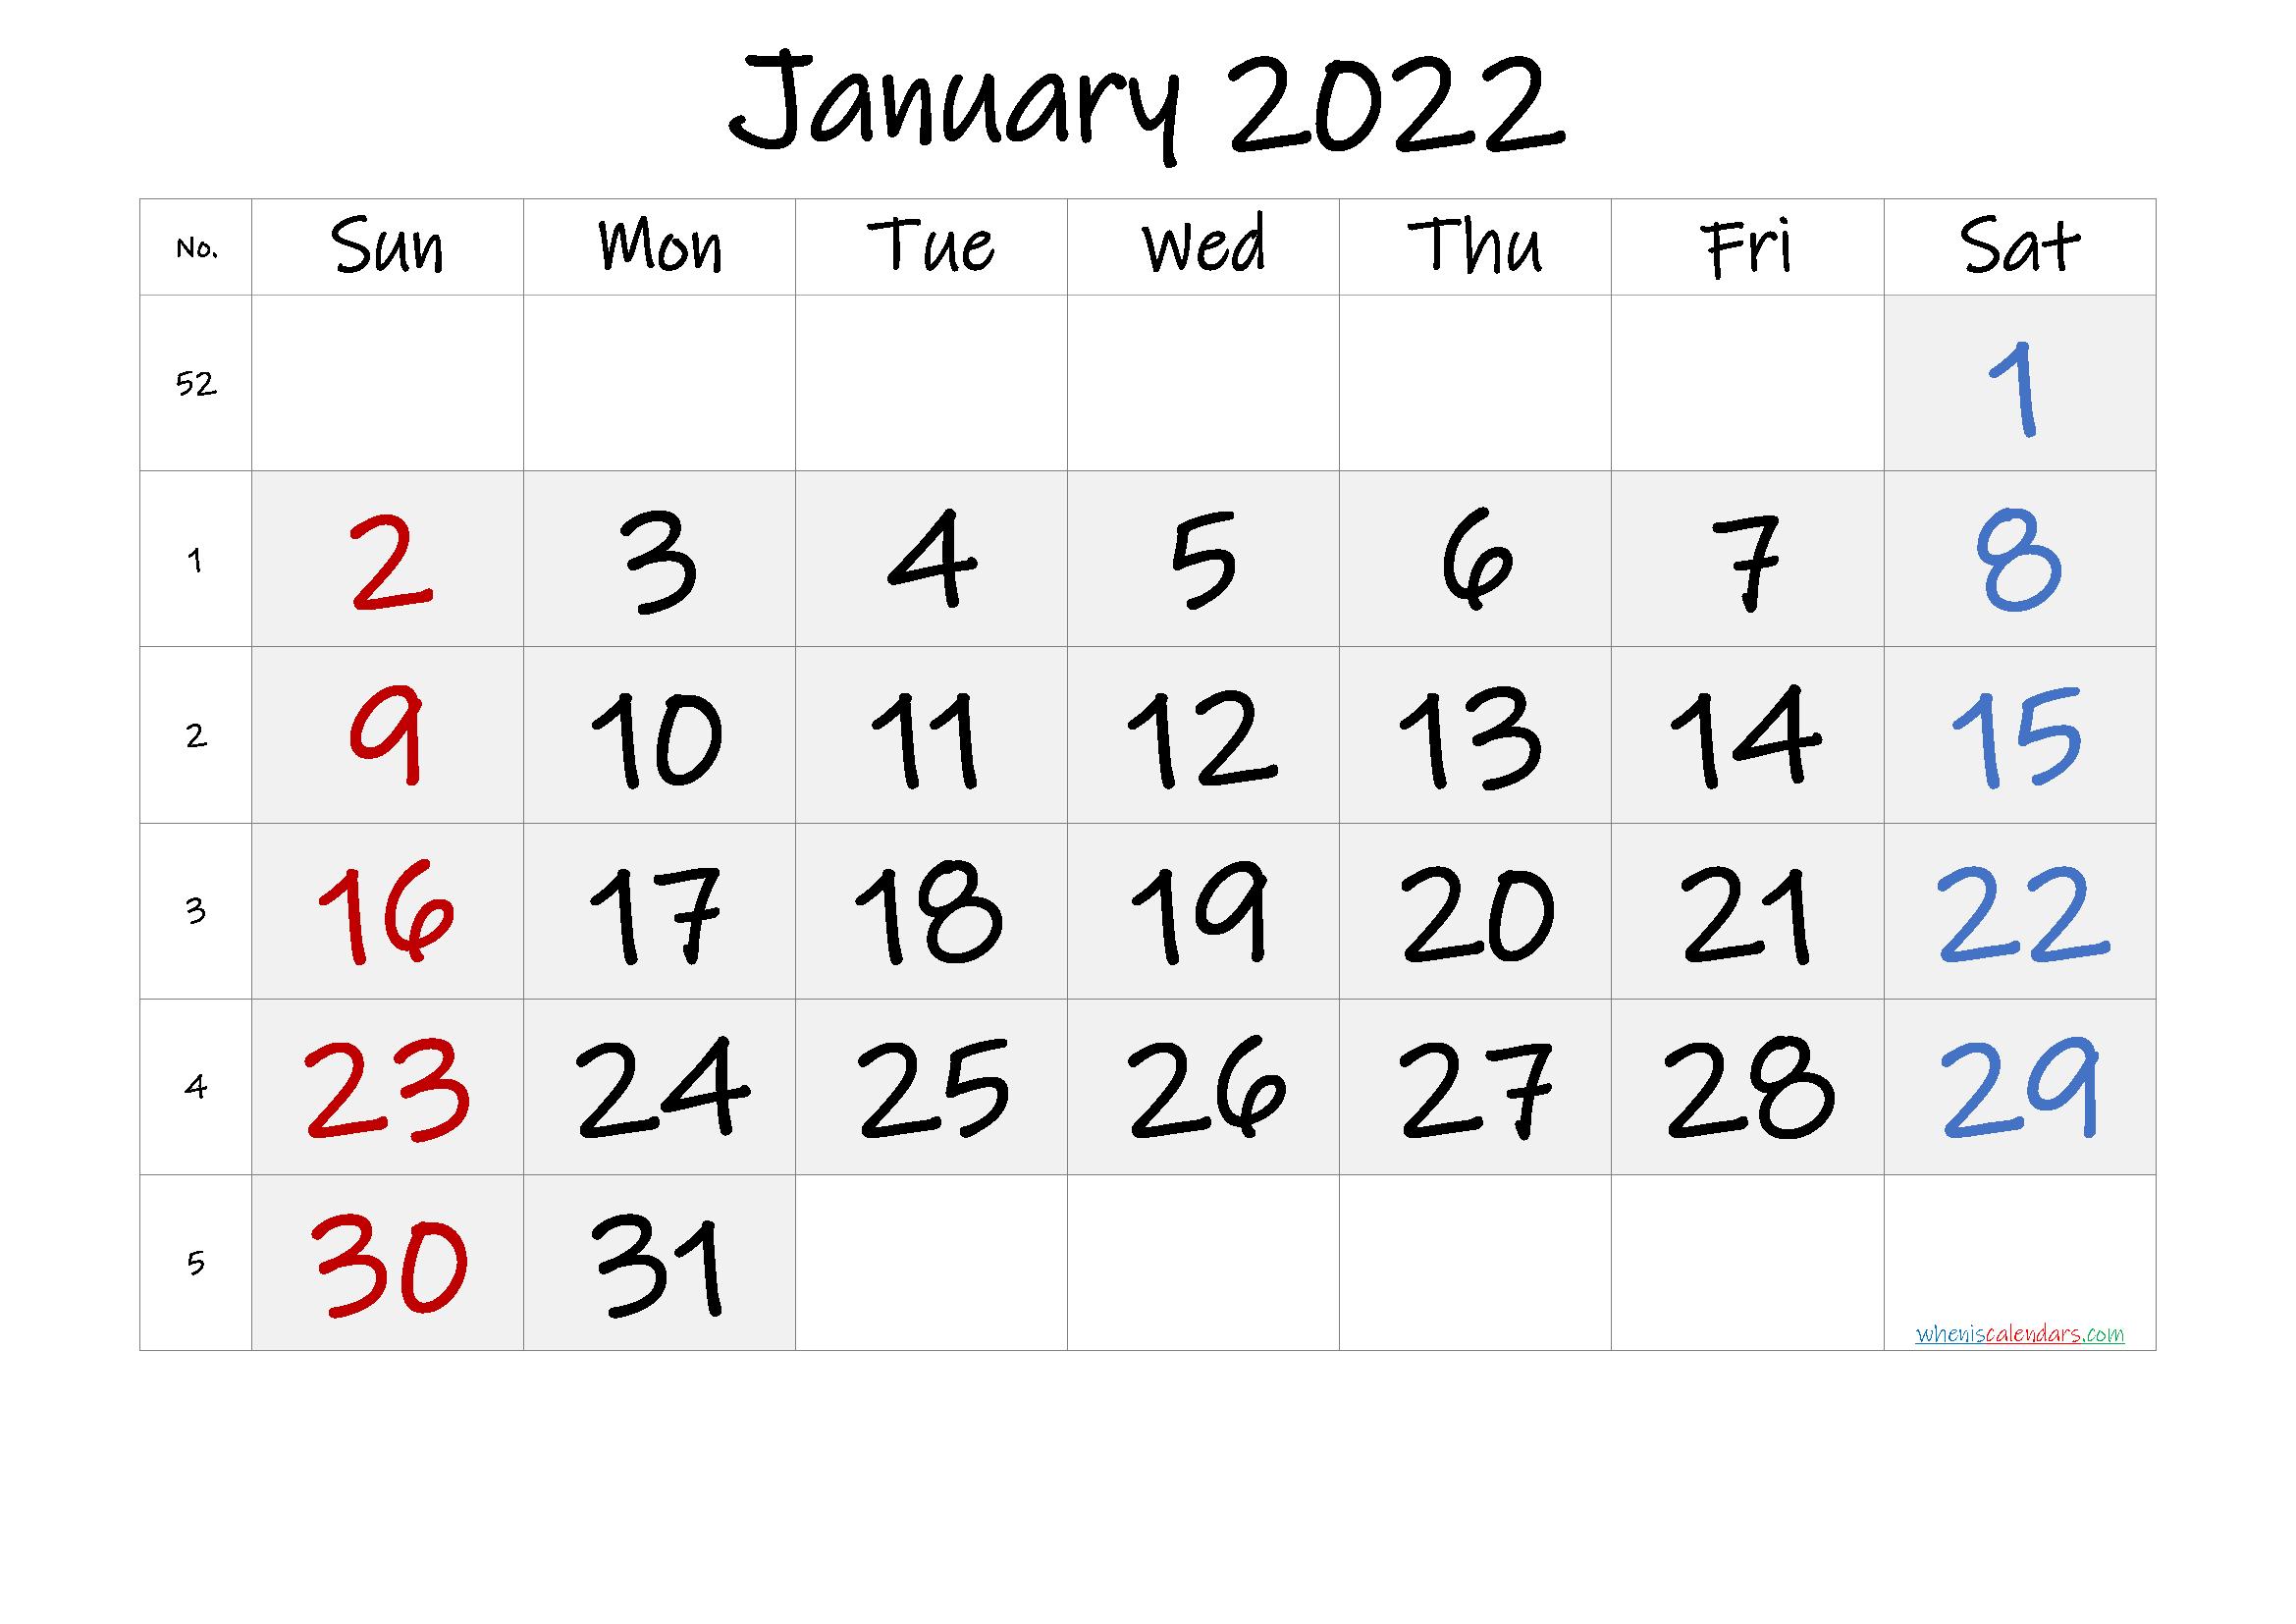 Free Printable January 2022 Calendar with Week Numbers